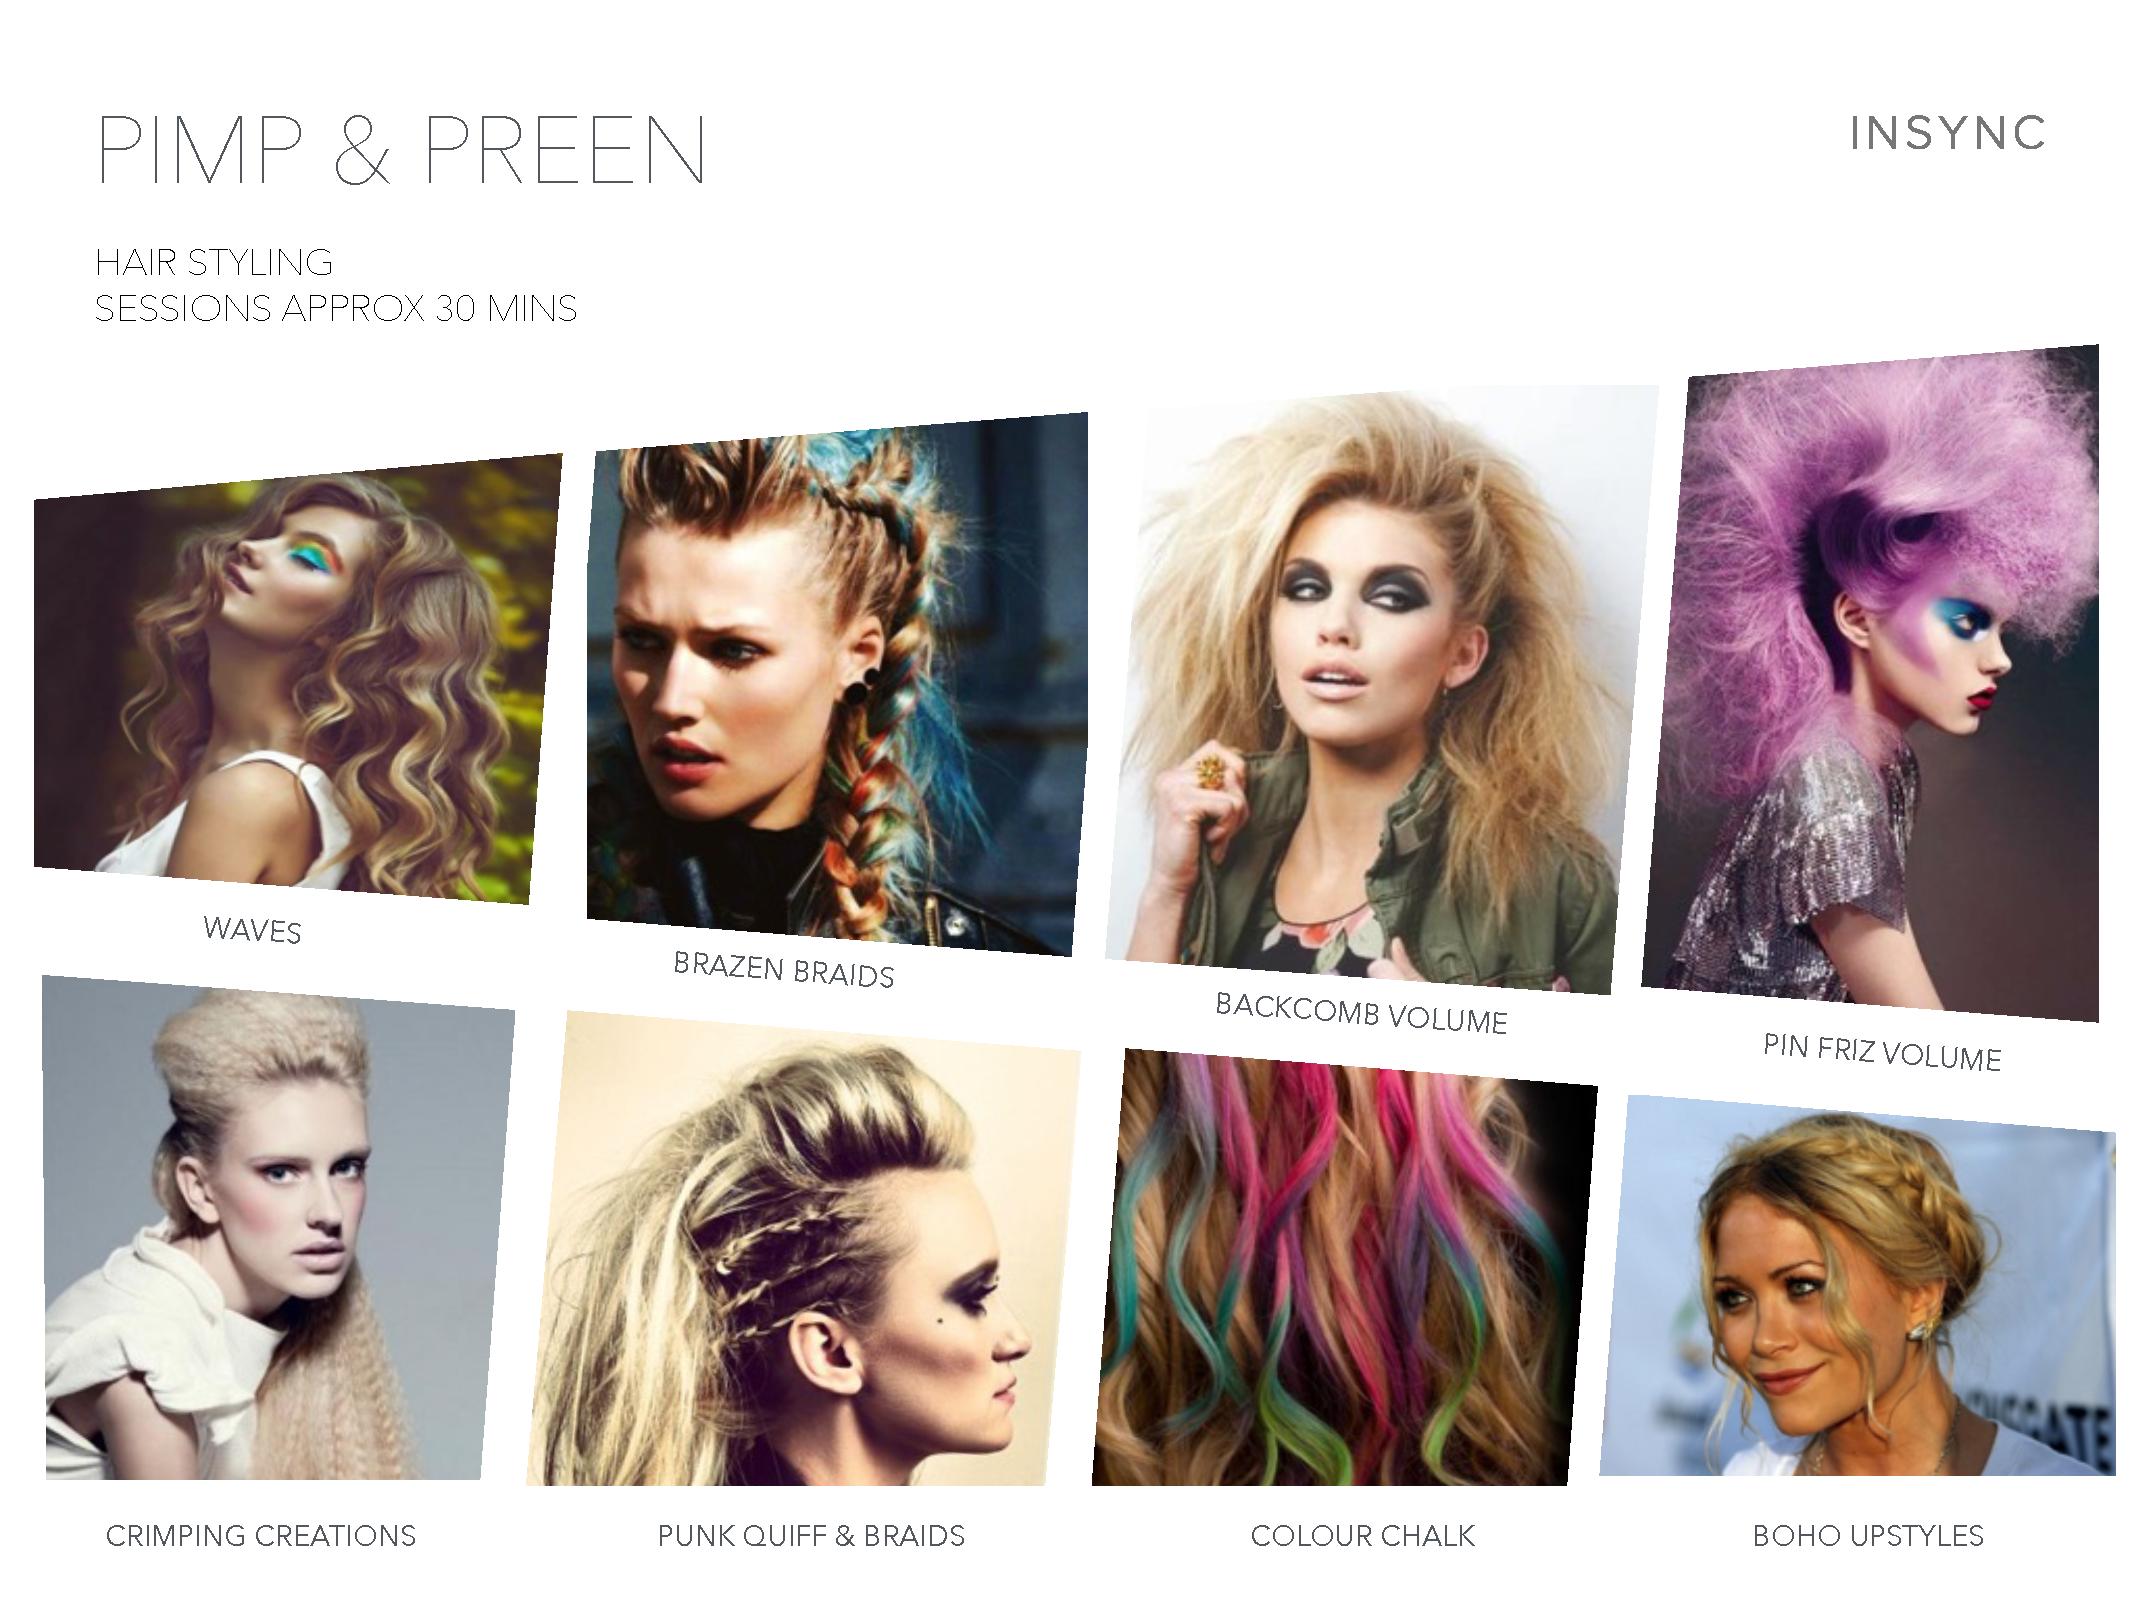 Pimp & Preen_Page_06.png